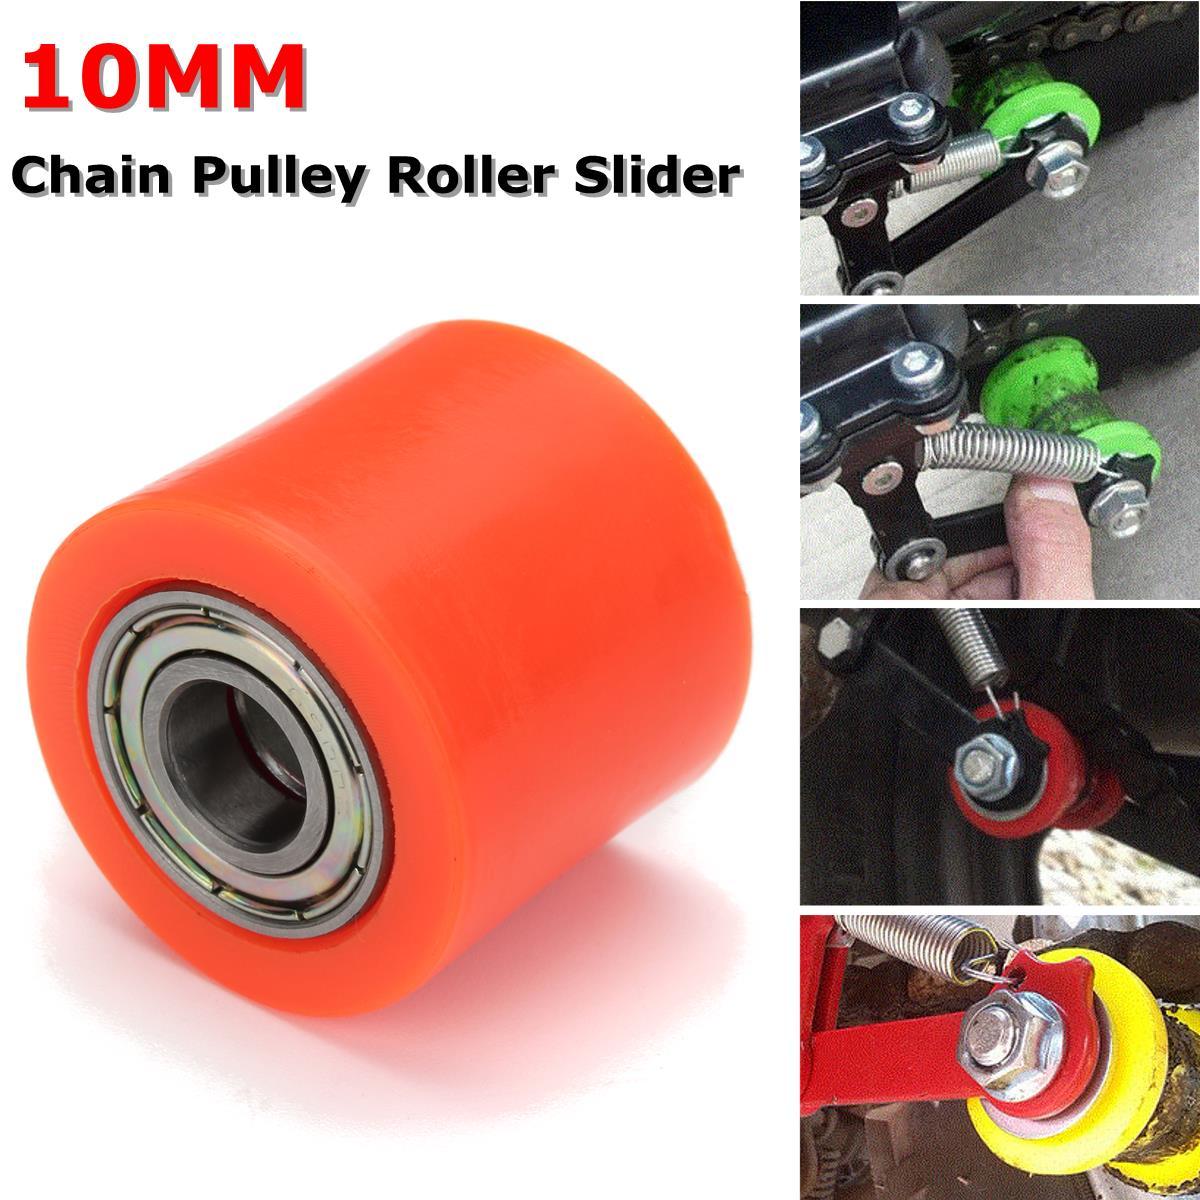 10mm Chain Pulley Roller Slider